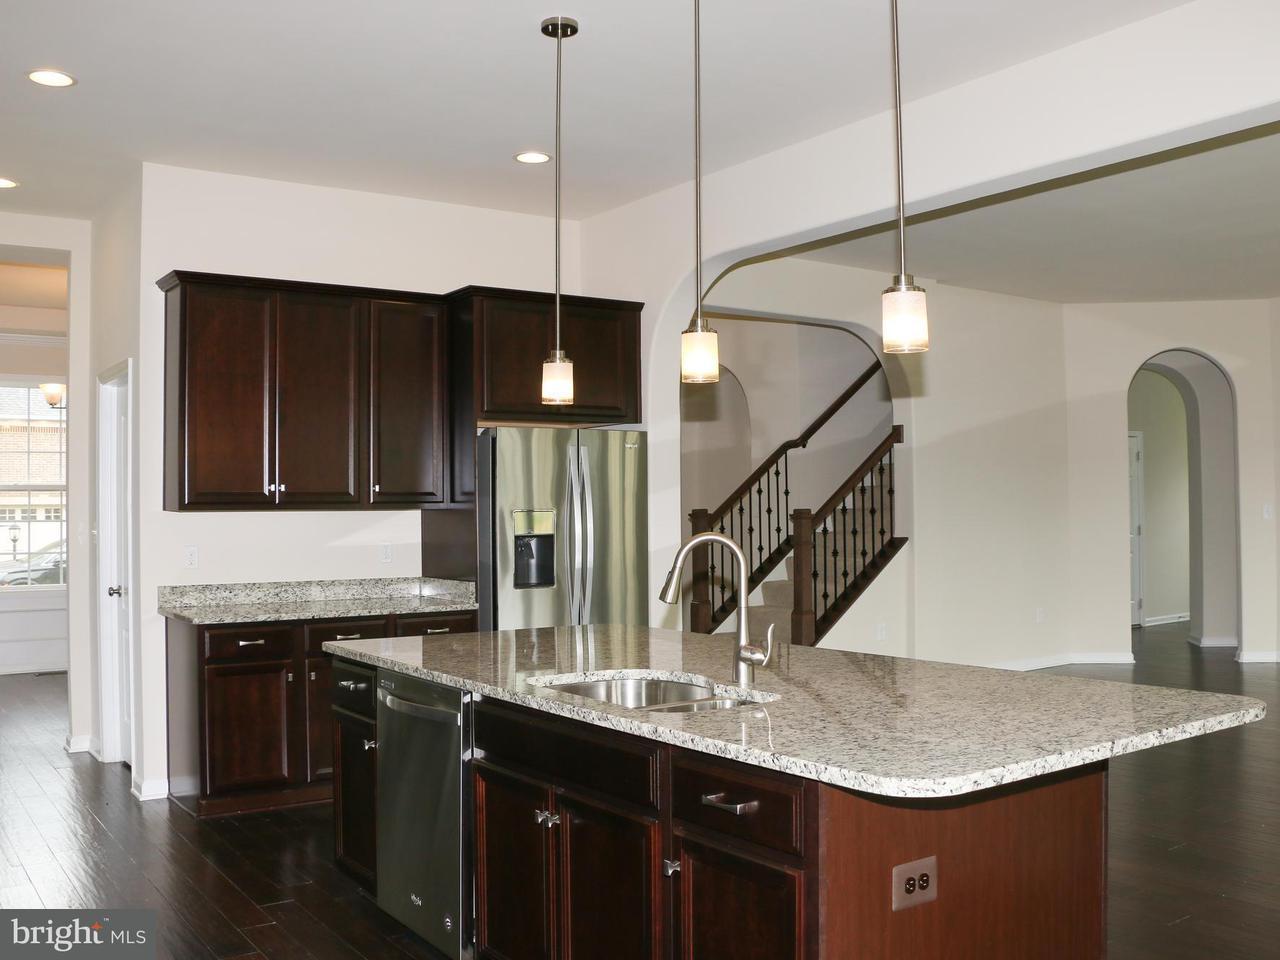 Additional photo for property listing at 38 Bradbury Way  Stafford, Virginia 22554 United States